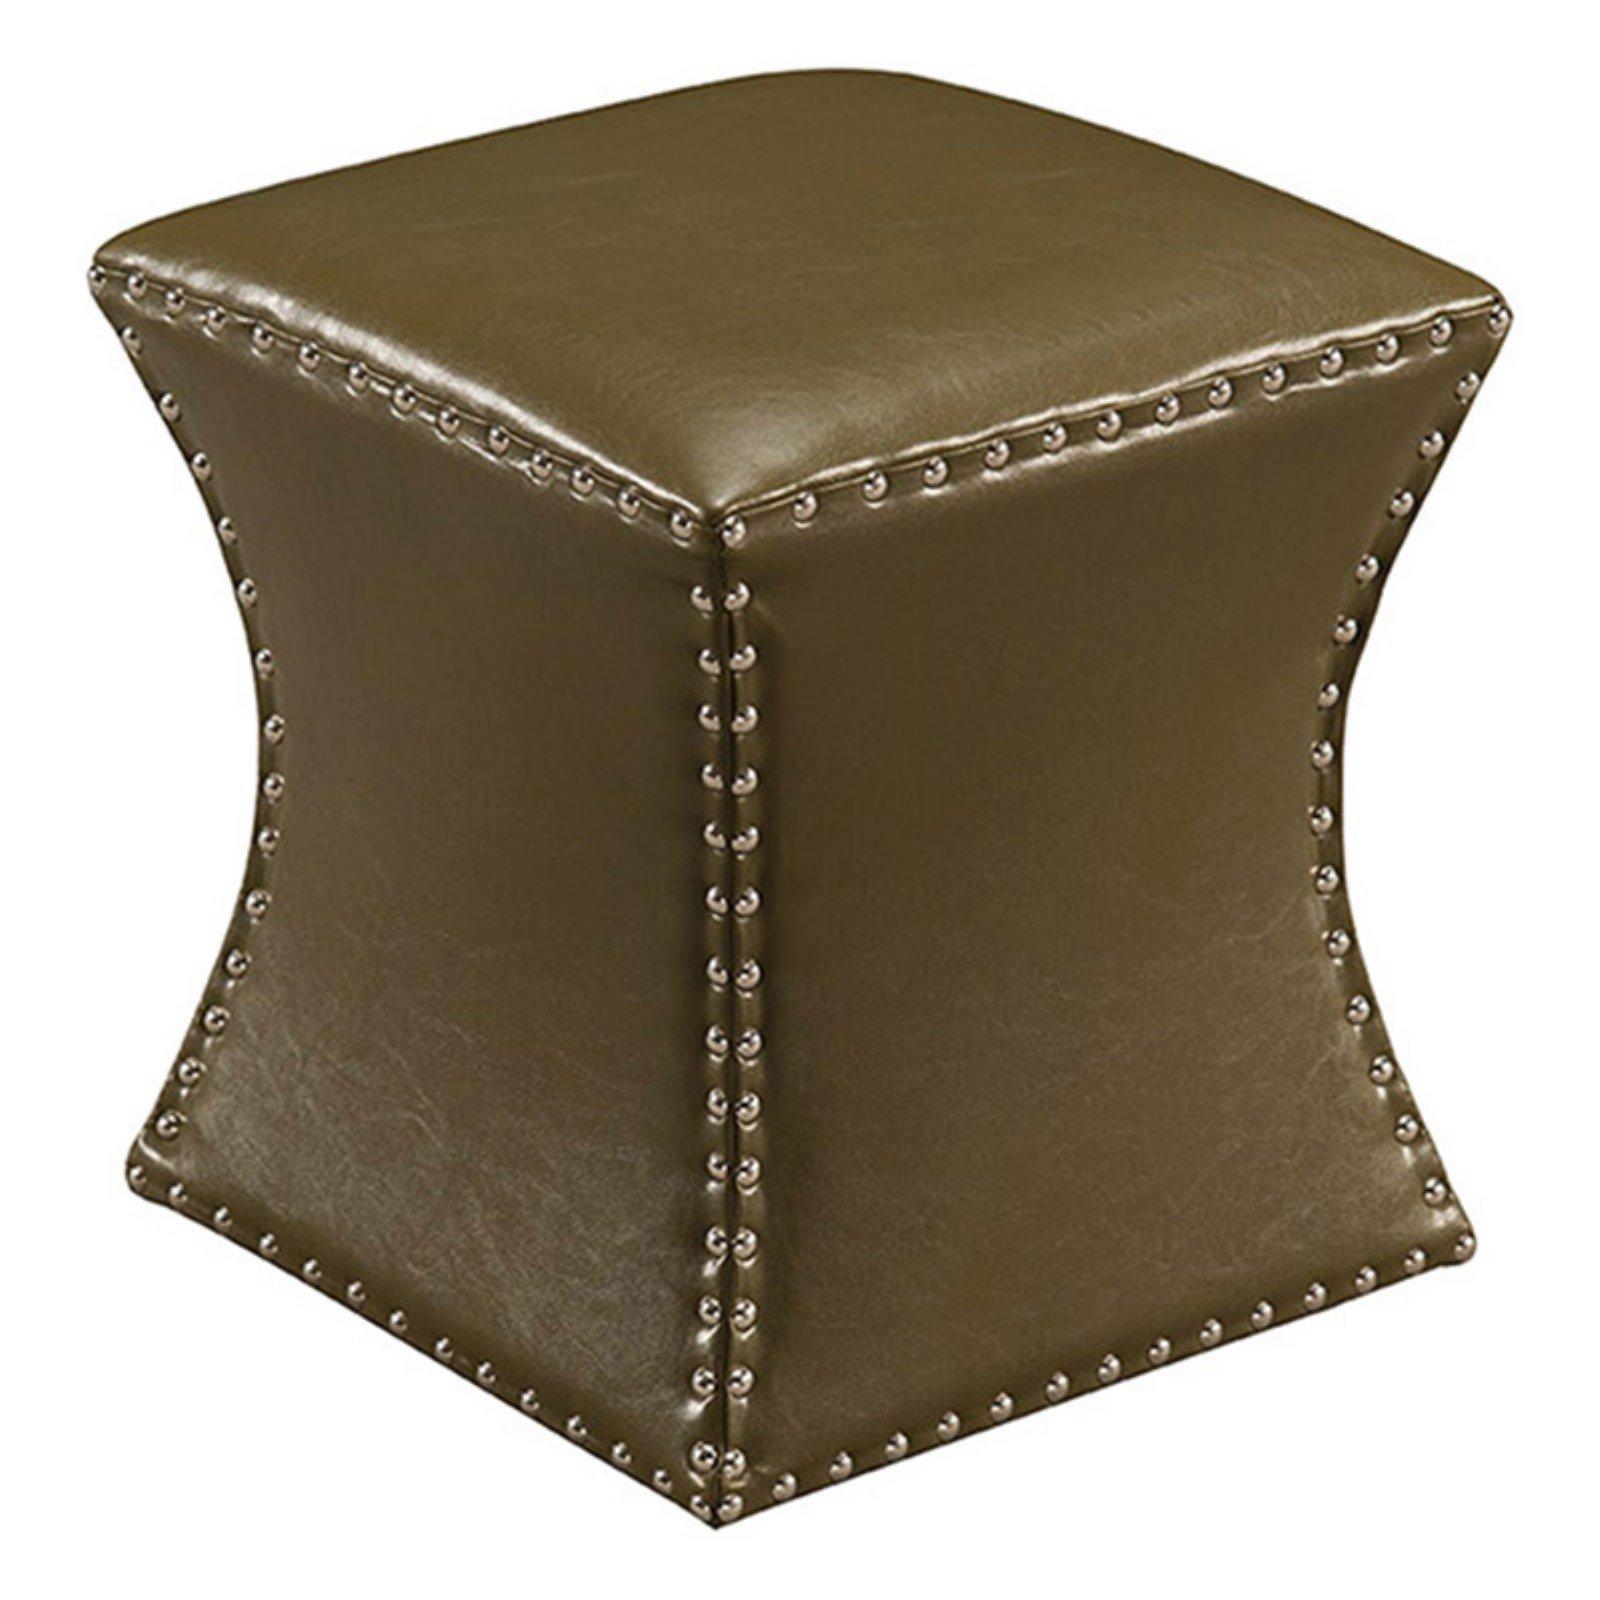 K&B Furniture Faux Leather Square Ottoman